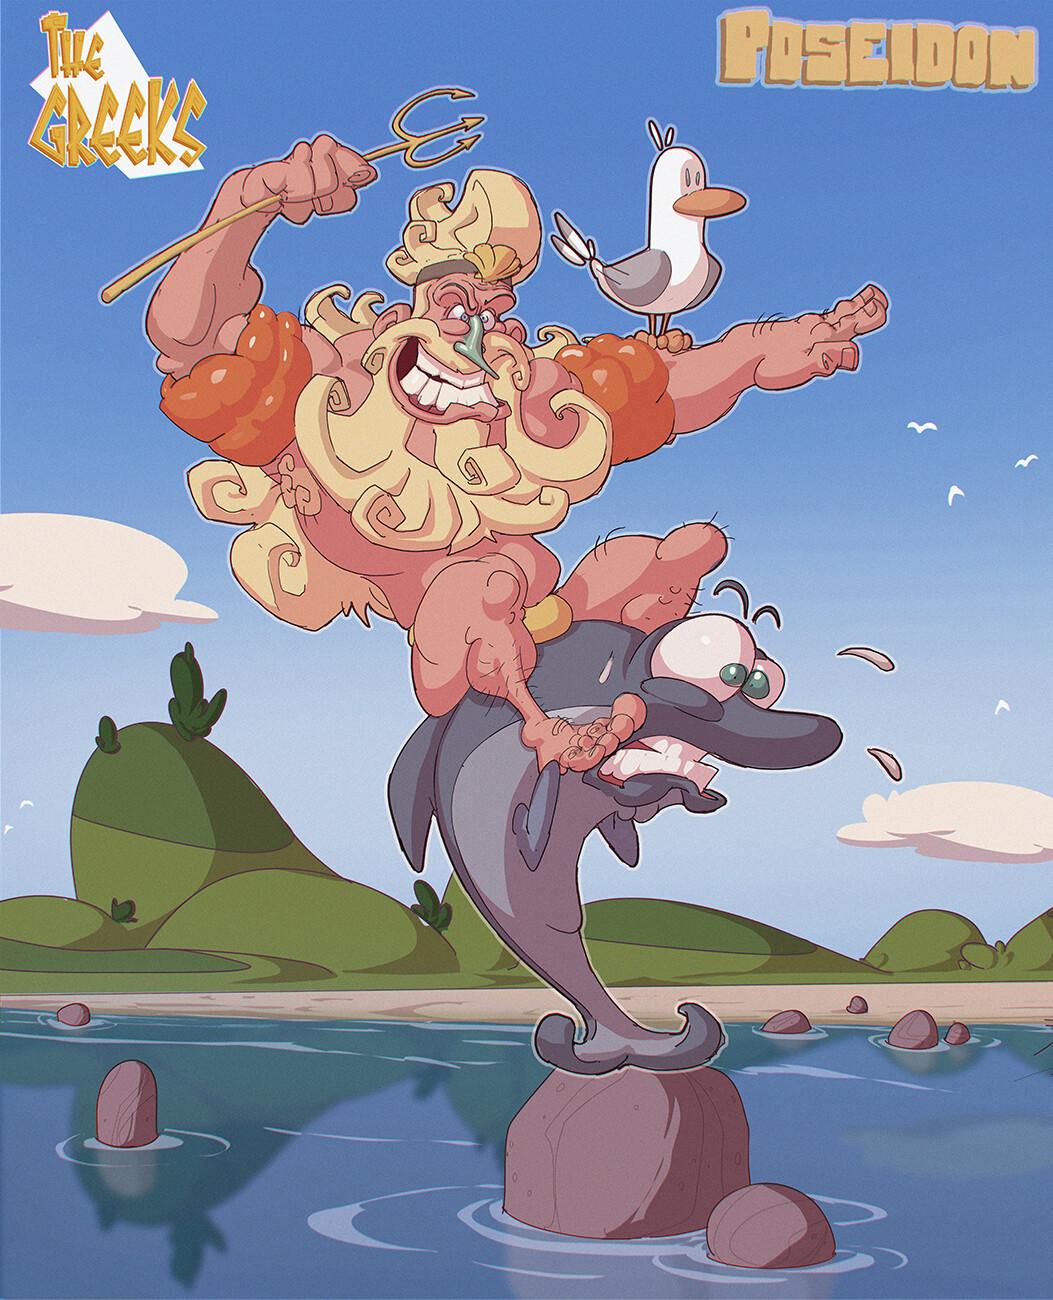 Poseidon Ridin' the Dolphin!